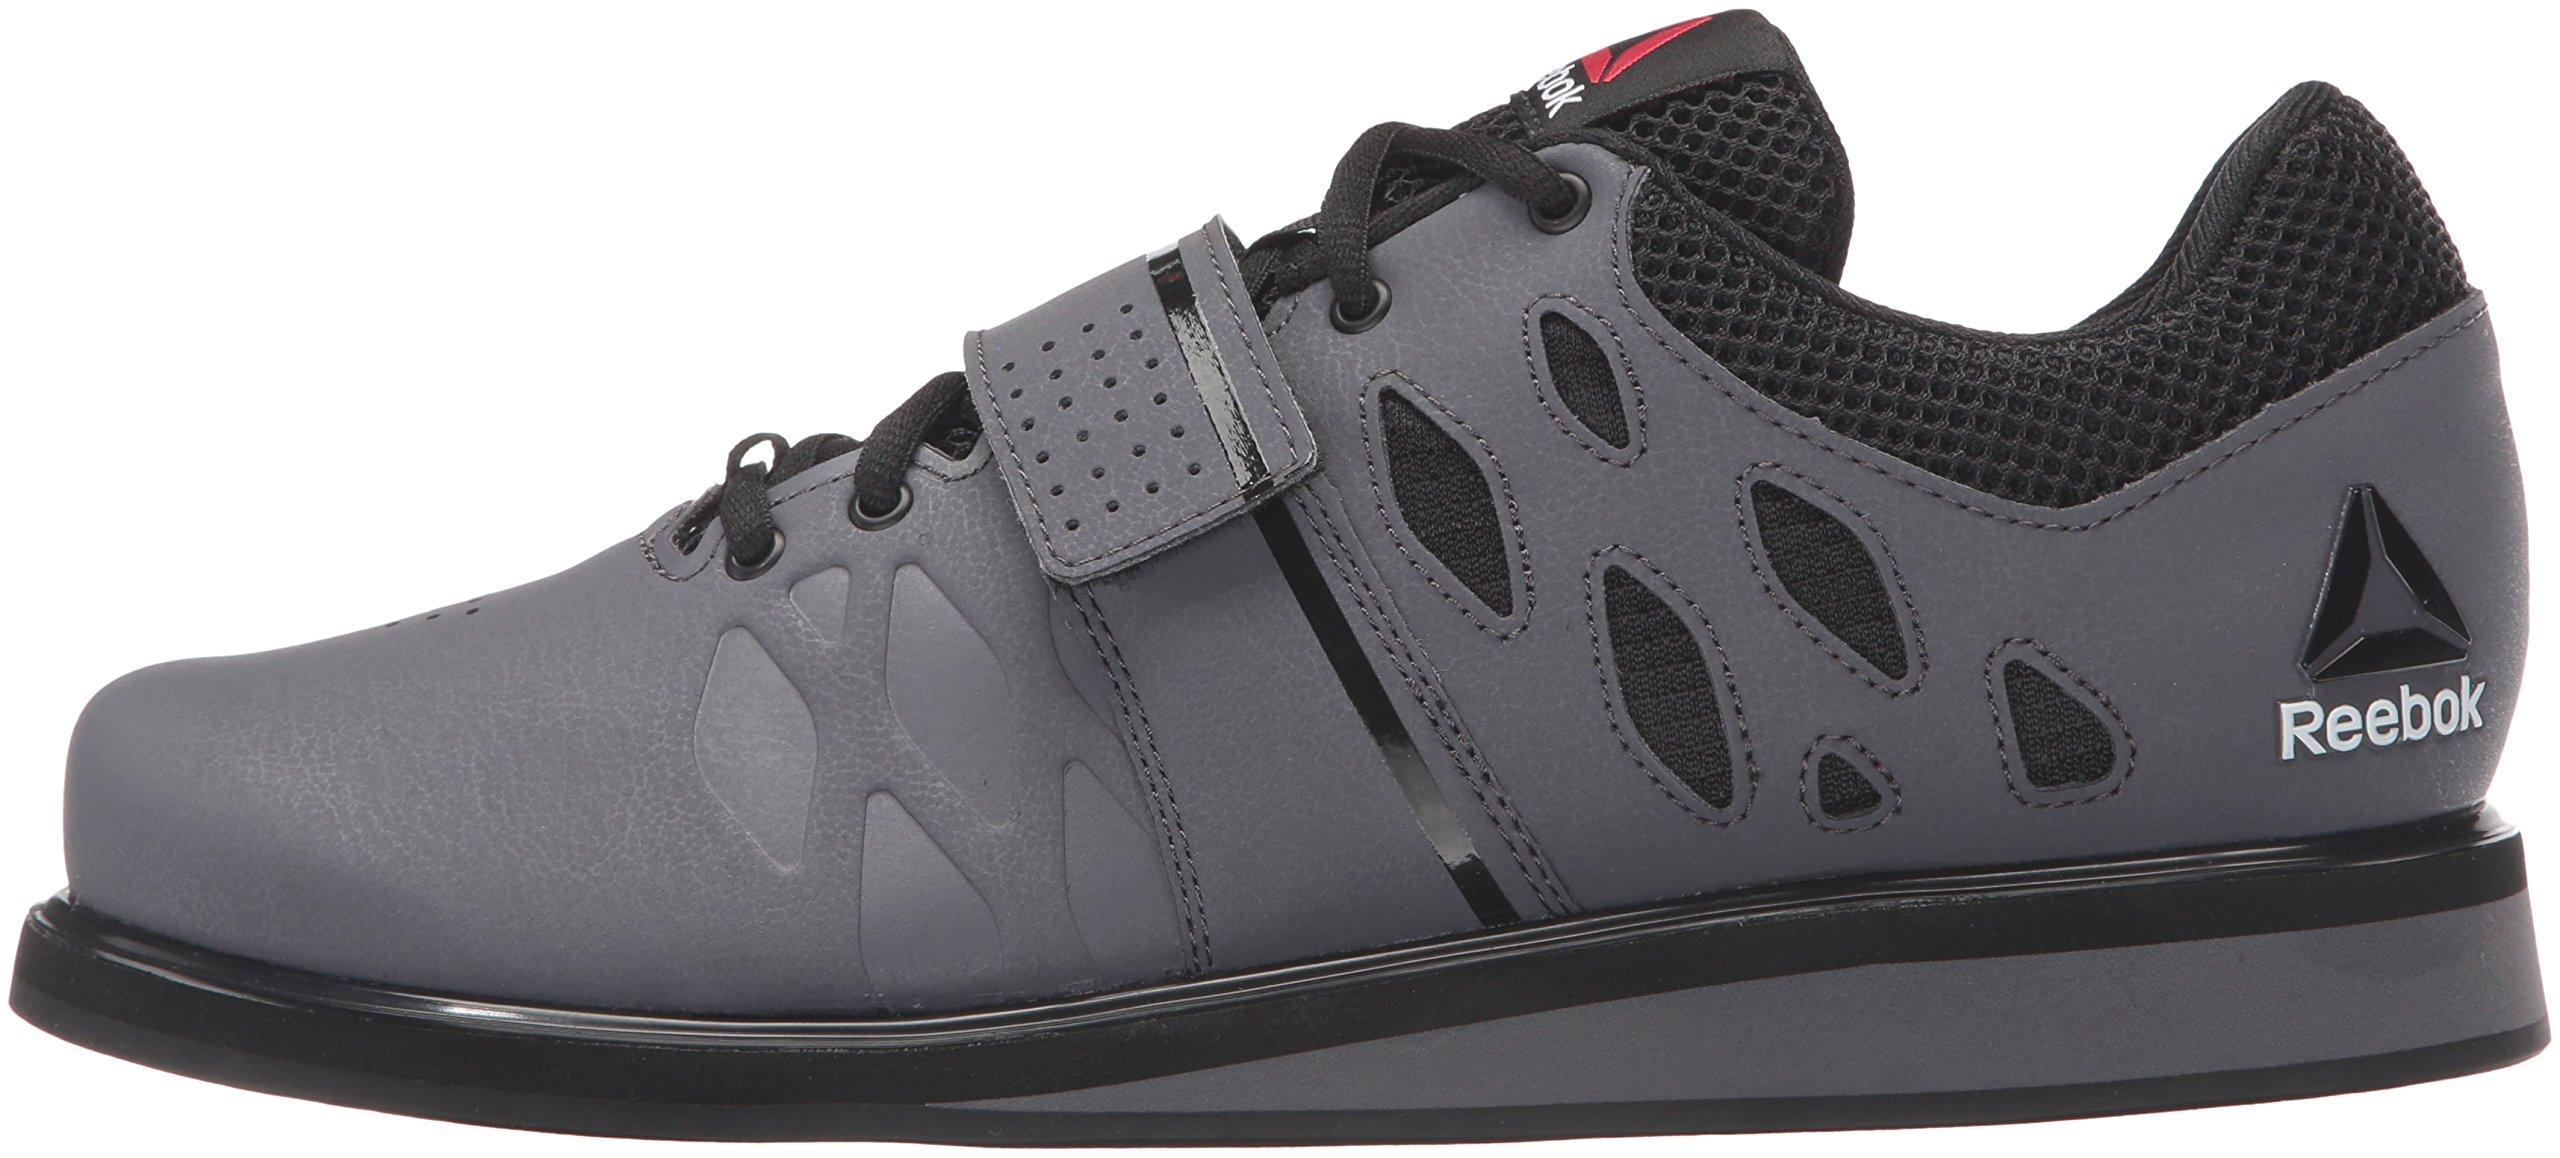 Reebok Men's Lifter Pr Cross-Trainer Shoe, Ash Grey/Black/White, 7 M US by Reebok (Image #5)